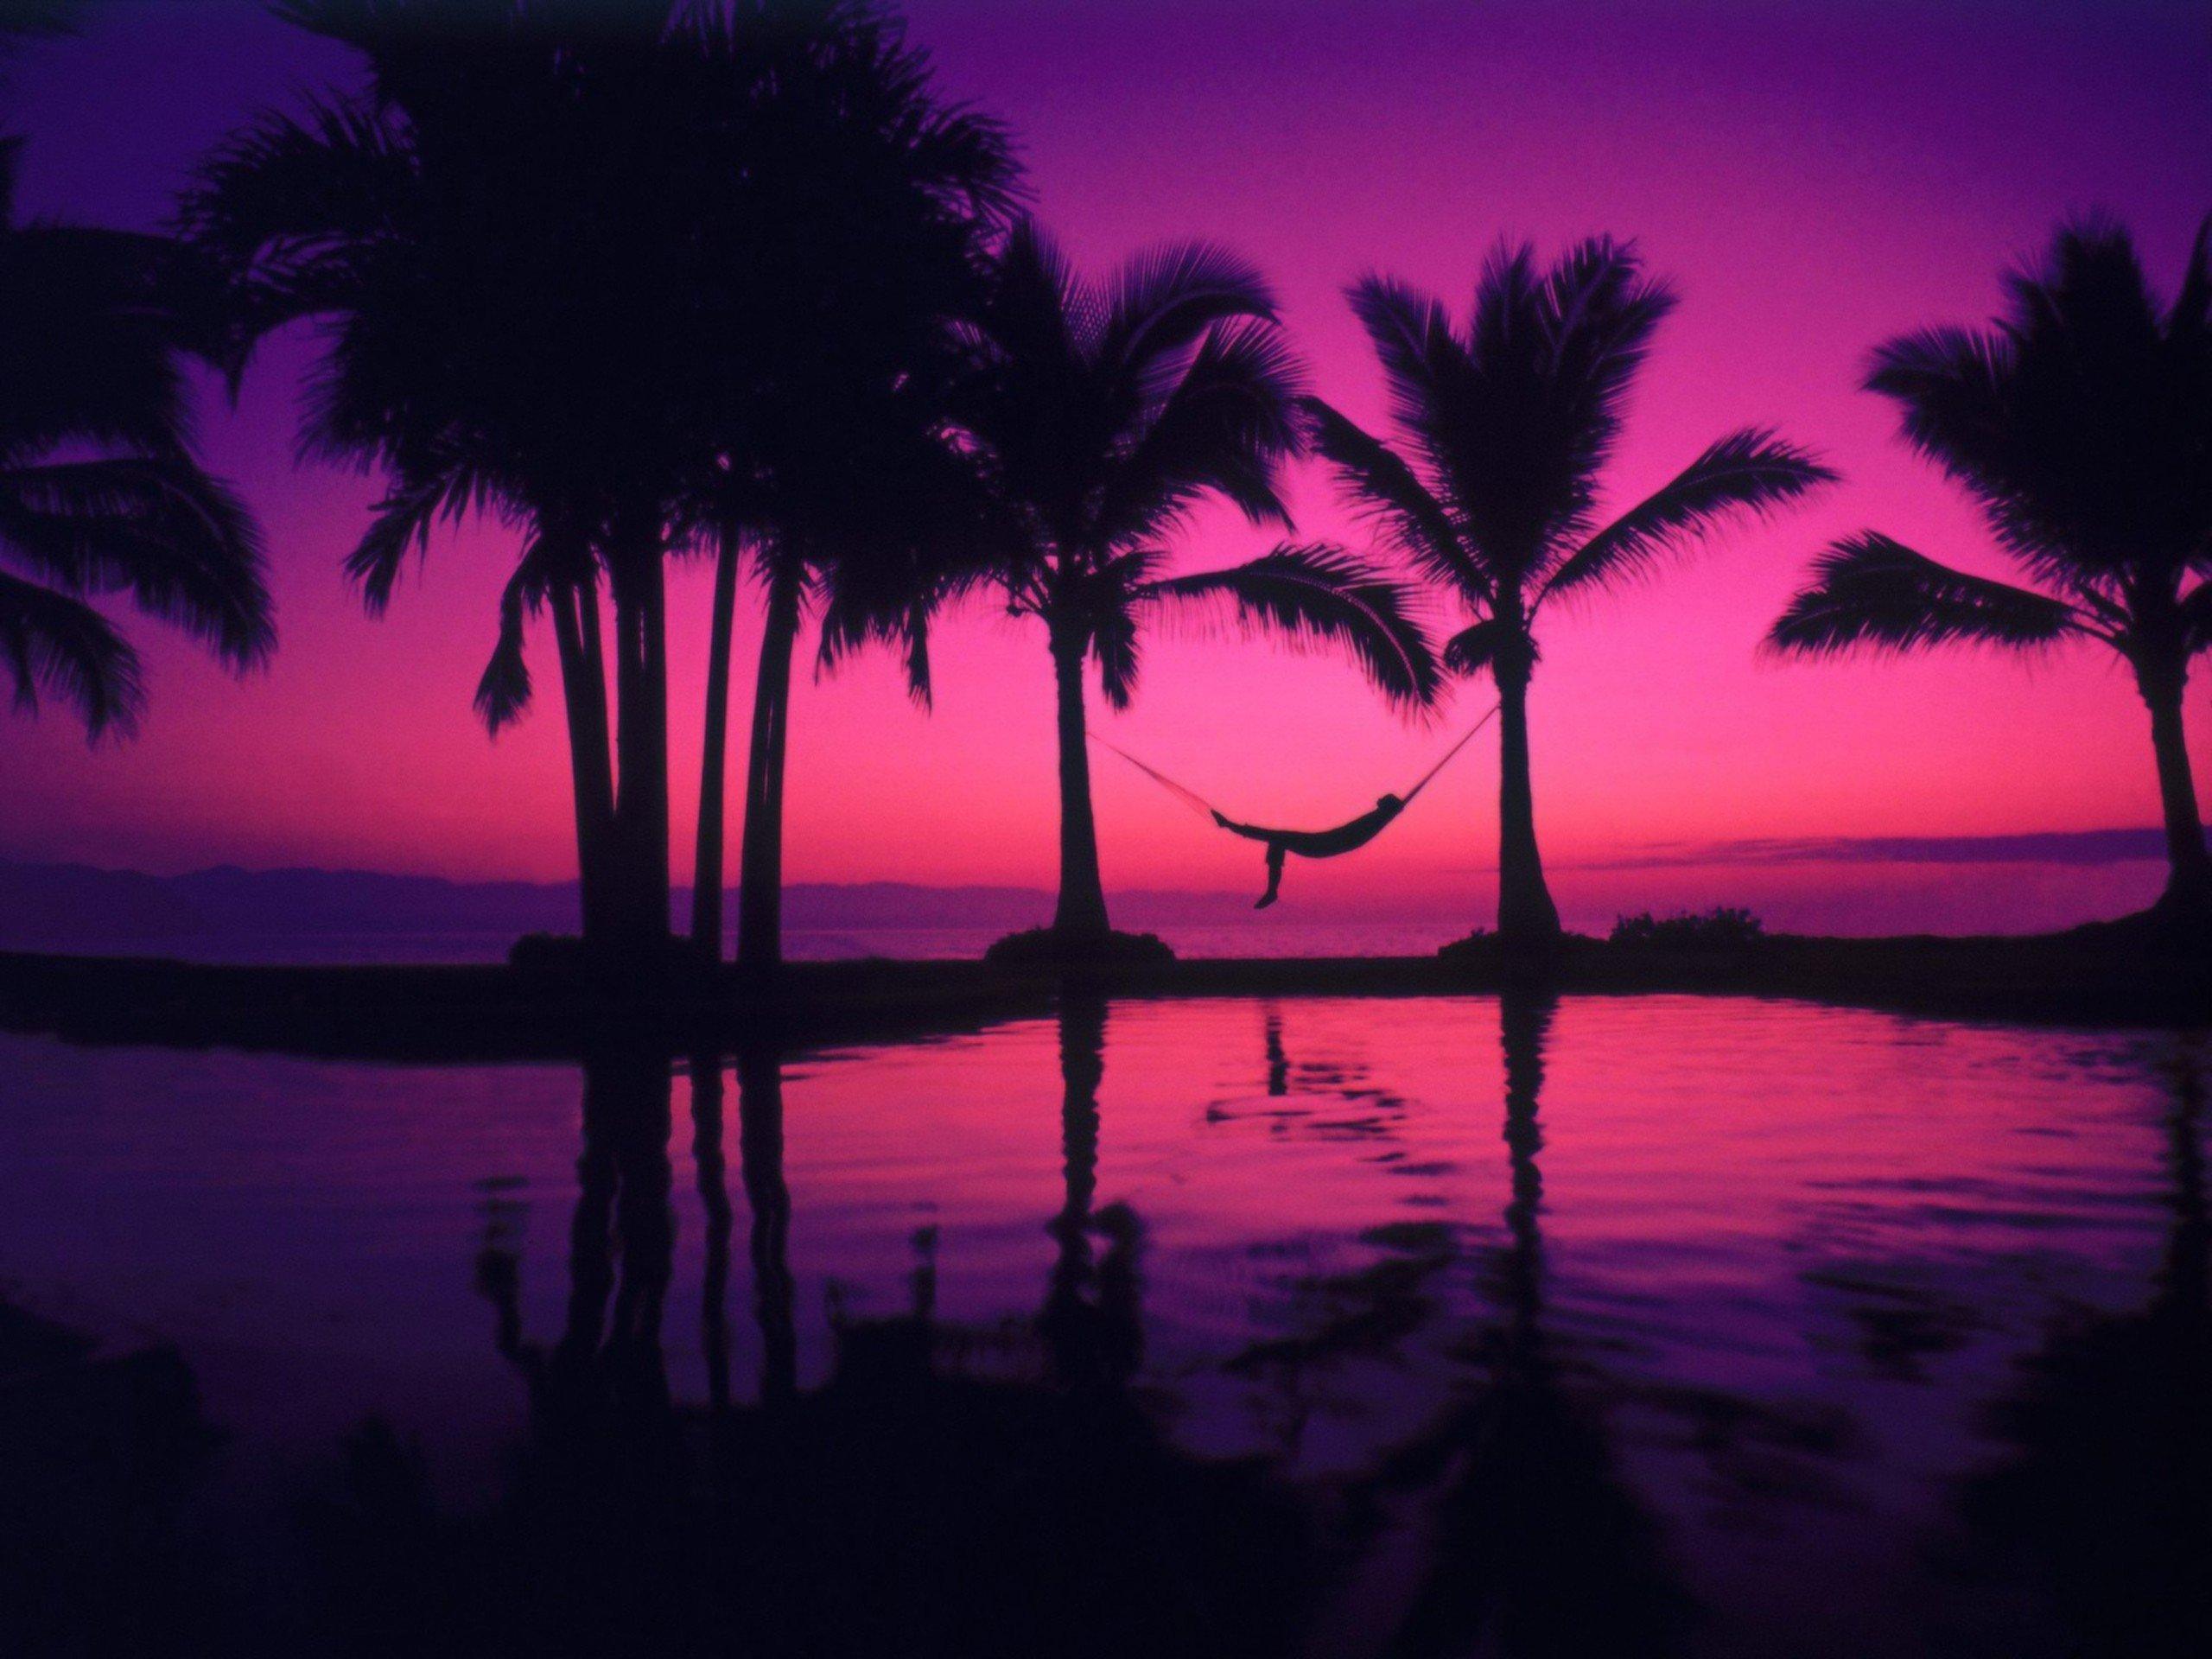 Wallpaper 2560x1920 Px Hammocks Palm Trees Relaxation Relaxing 2560x1920 Wallbase 1276887 Hd Wallpapers Wallhere